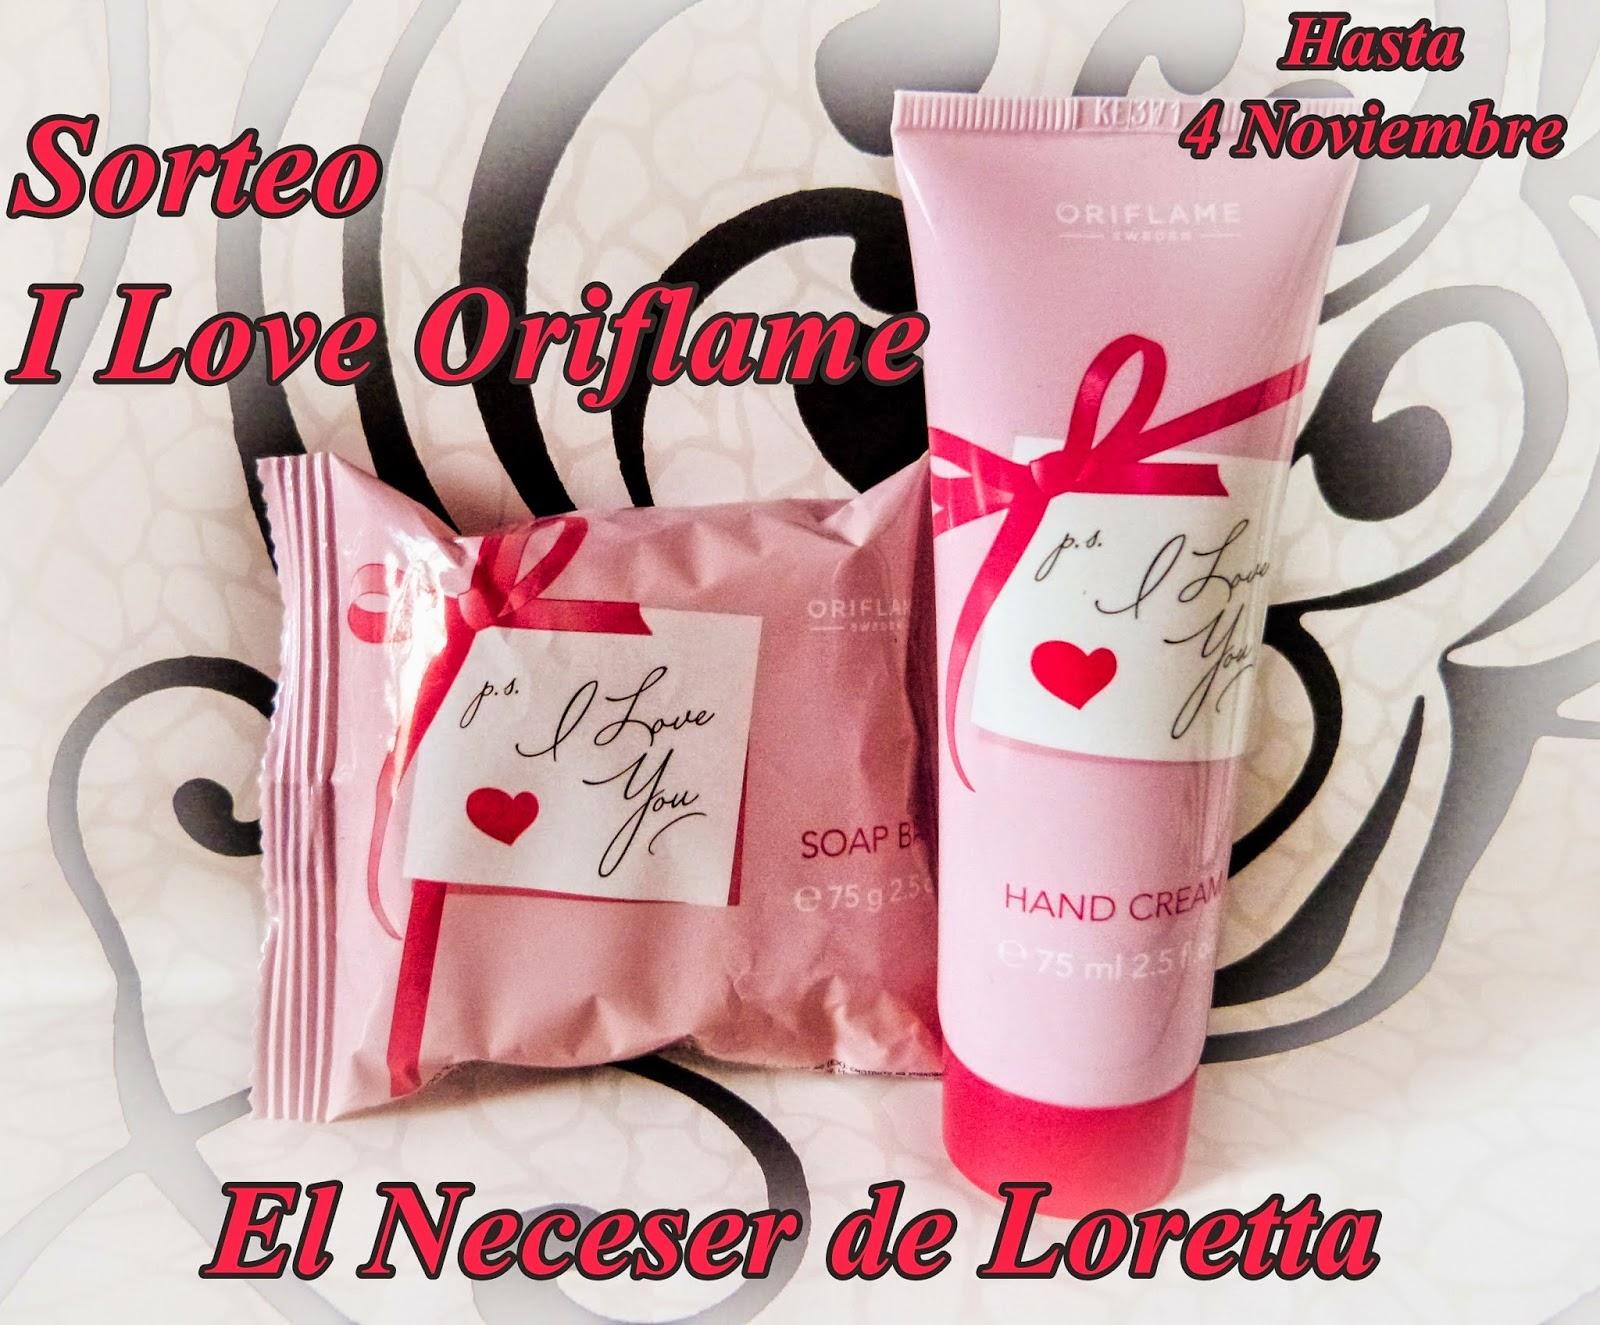 Sorteo I Love Oriflame